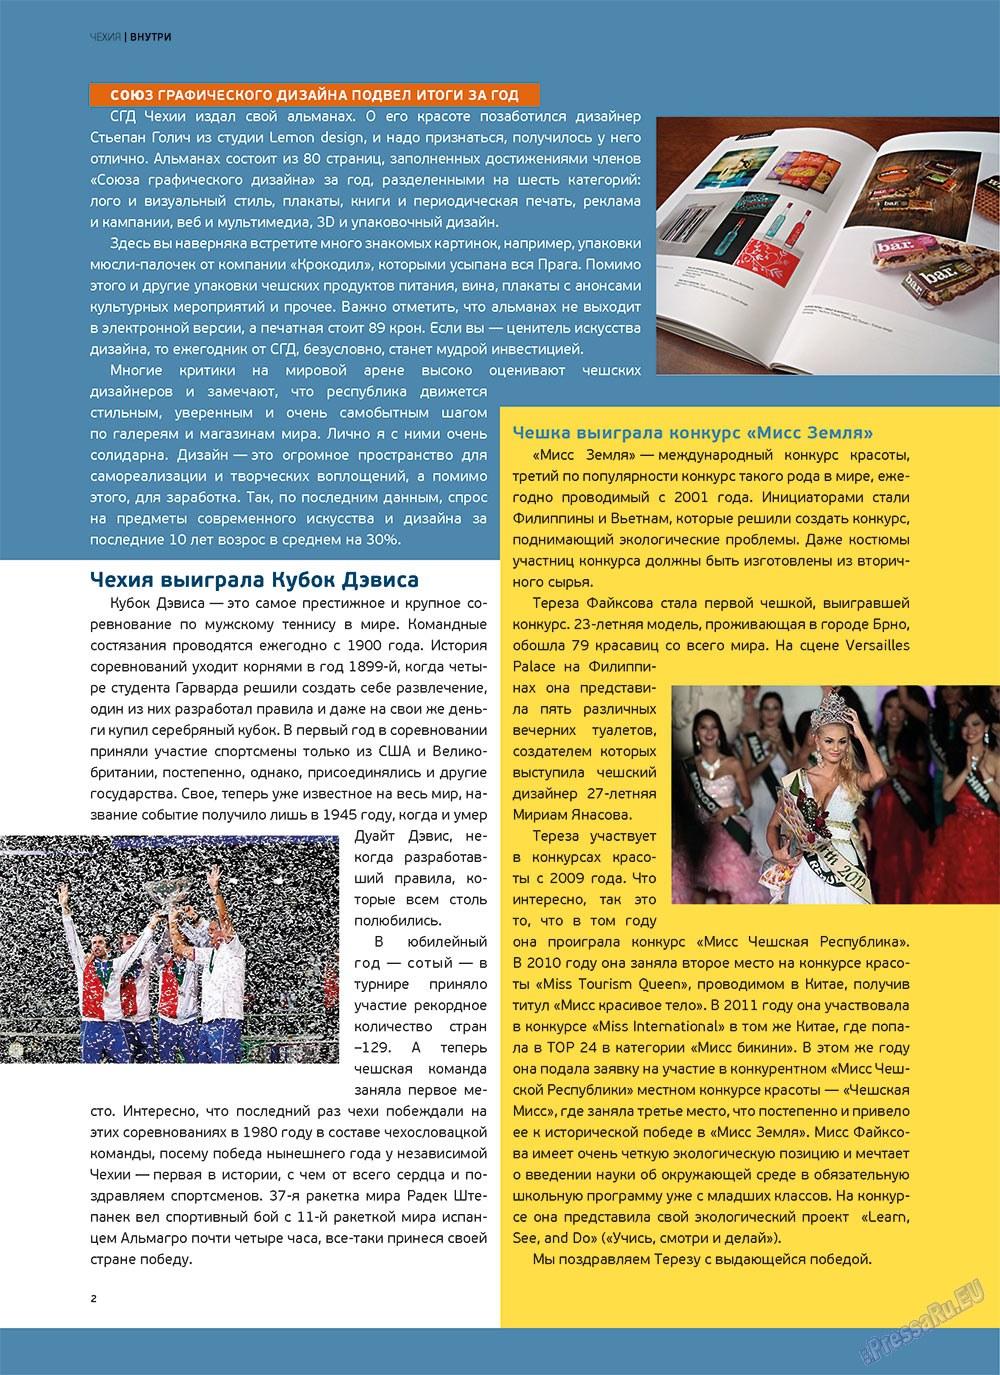 Артек (журнал). 2012 год, номер 5, стр. 4